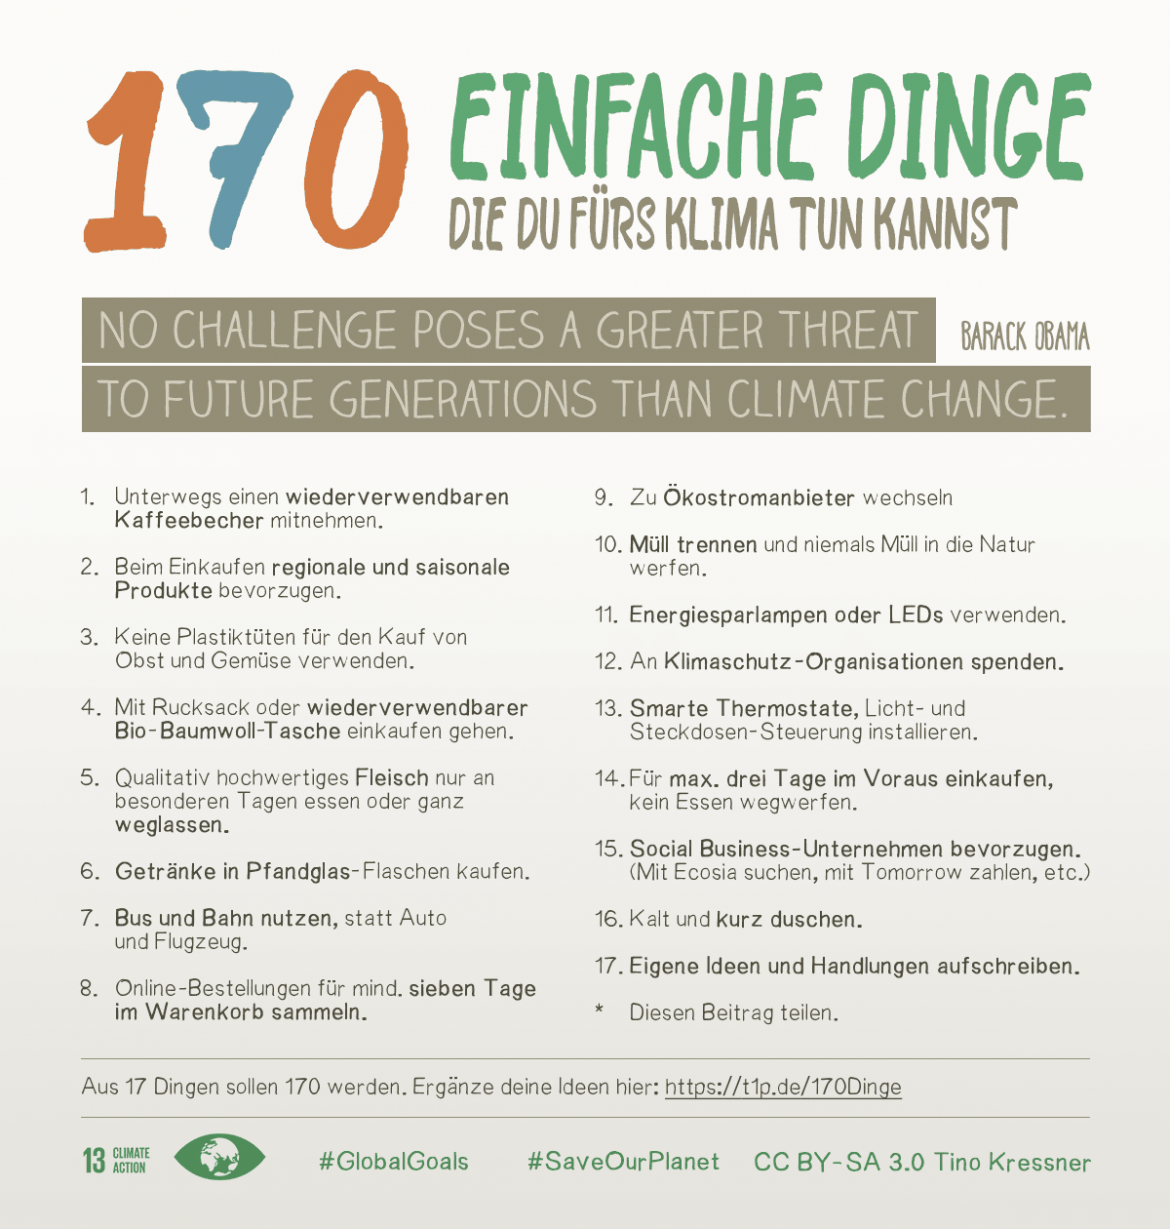 klima-fb3-1.png